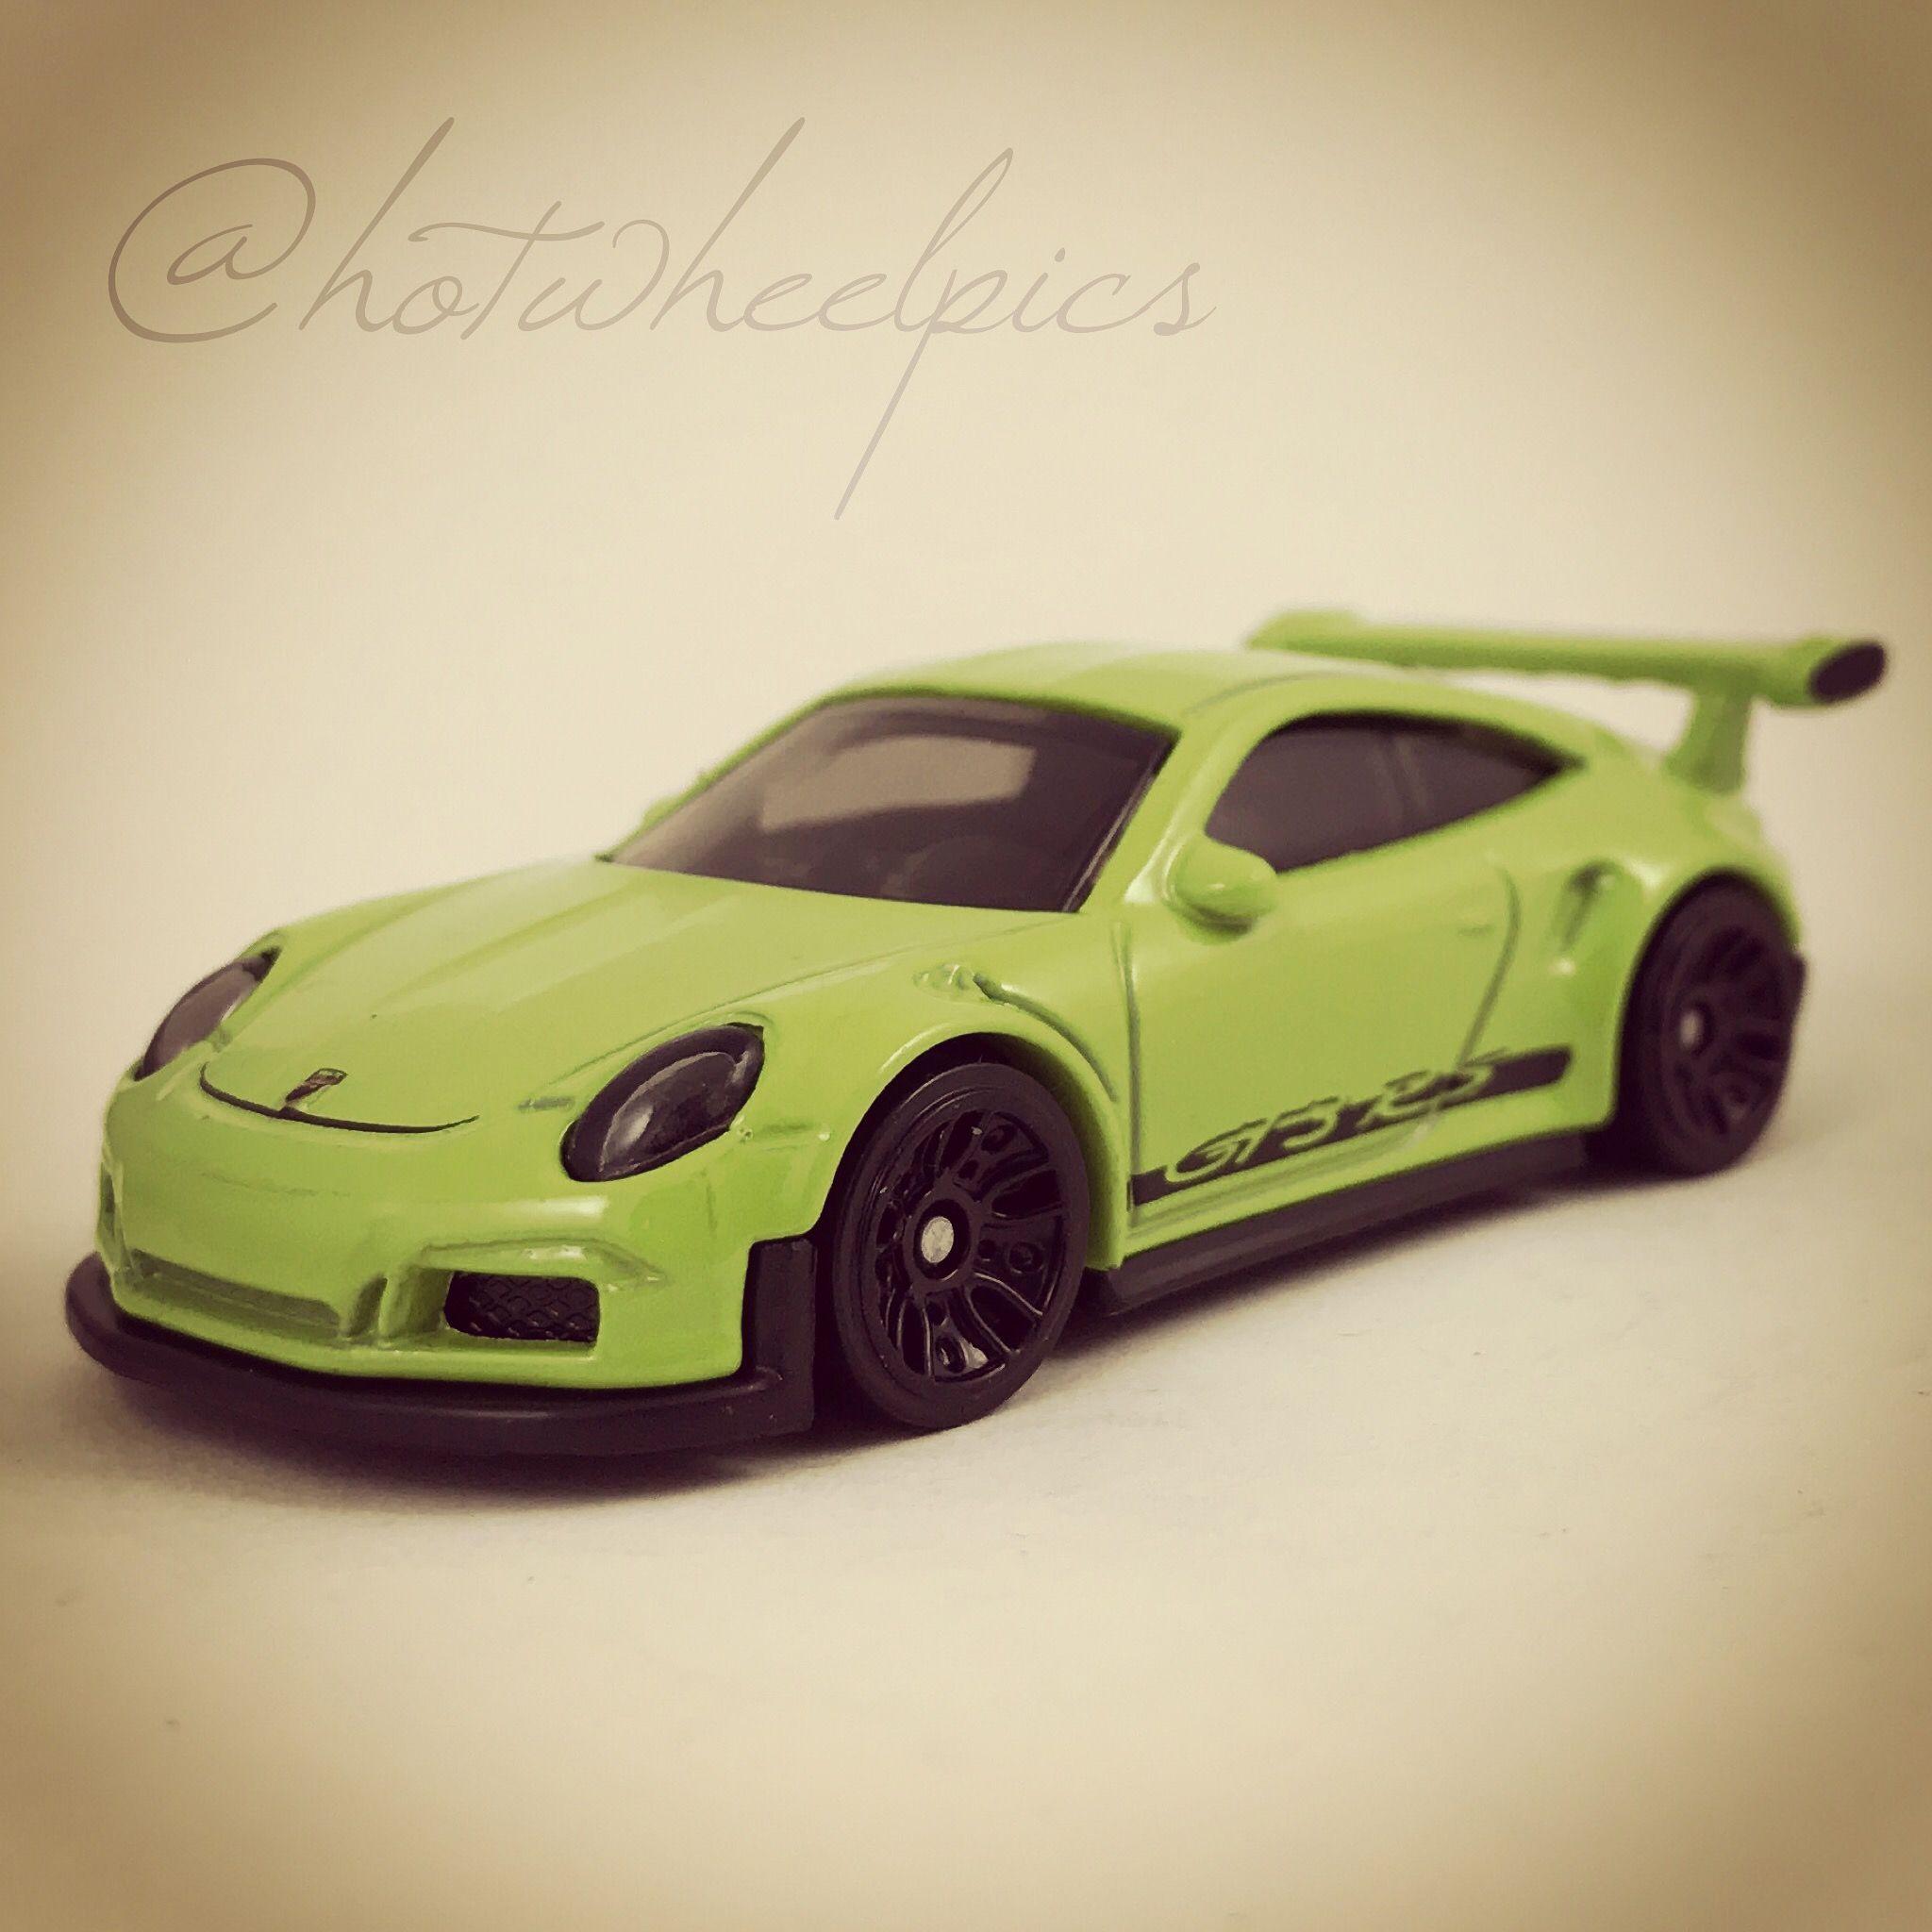 156ccfc52283f027cc005fa9dccb5e39 Outstanding Porsche 911 Gt2 Hot Wheels Cars Trend